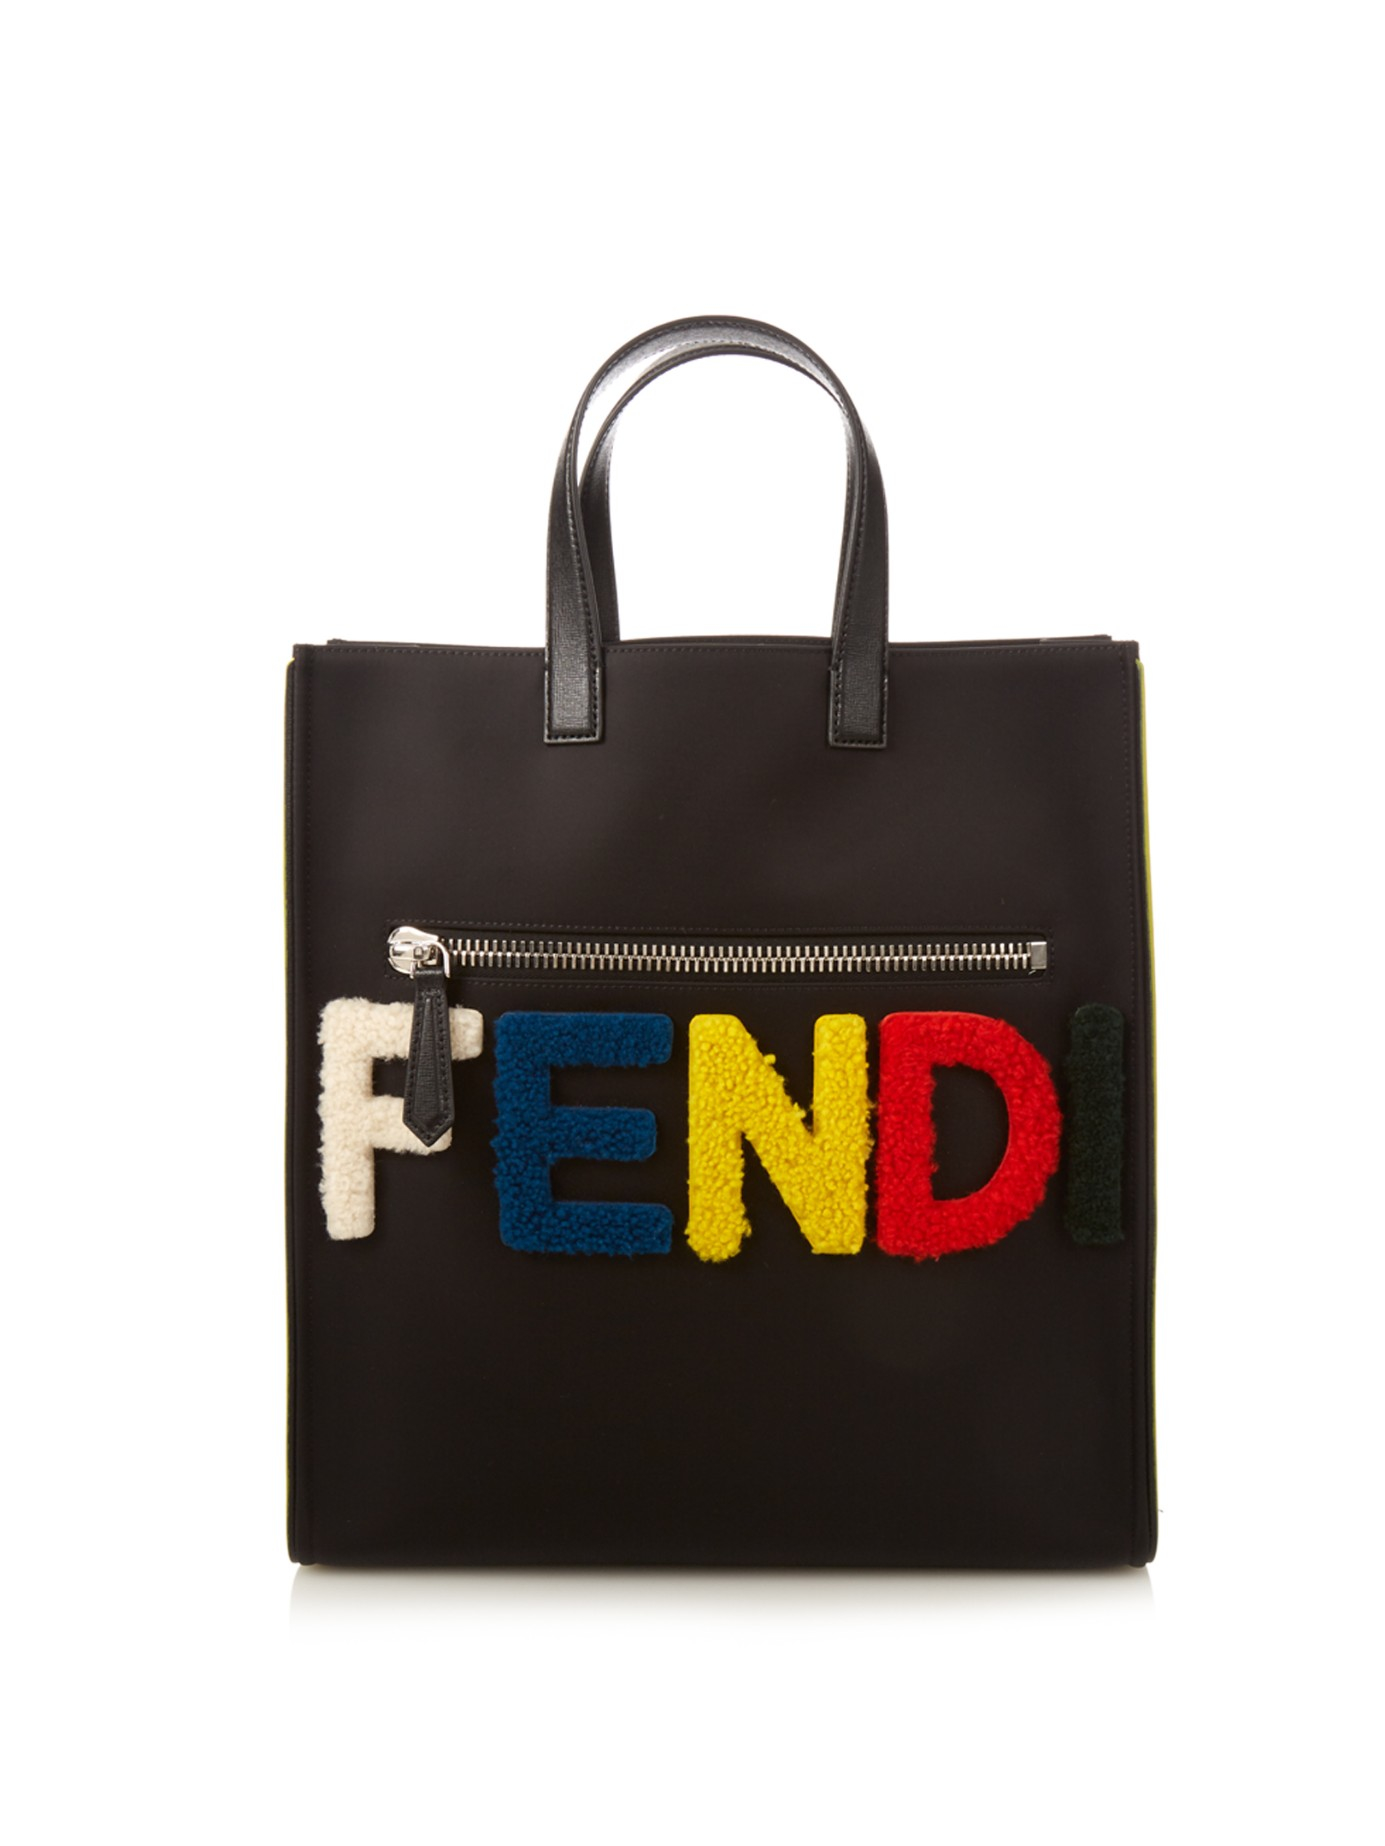 aaa3fe8566 Lyst - Fendi Furry Logo Nylon Tote in Black for Men